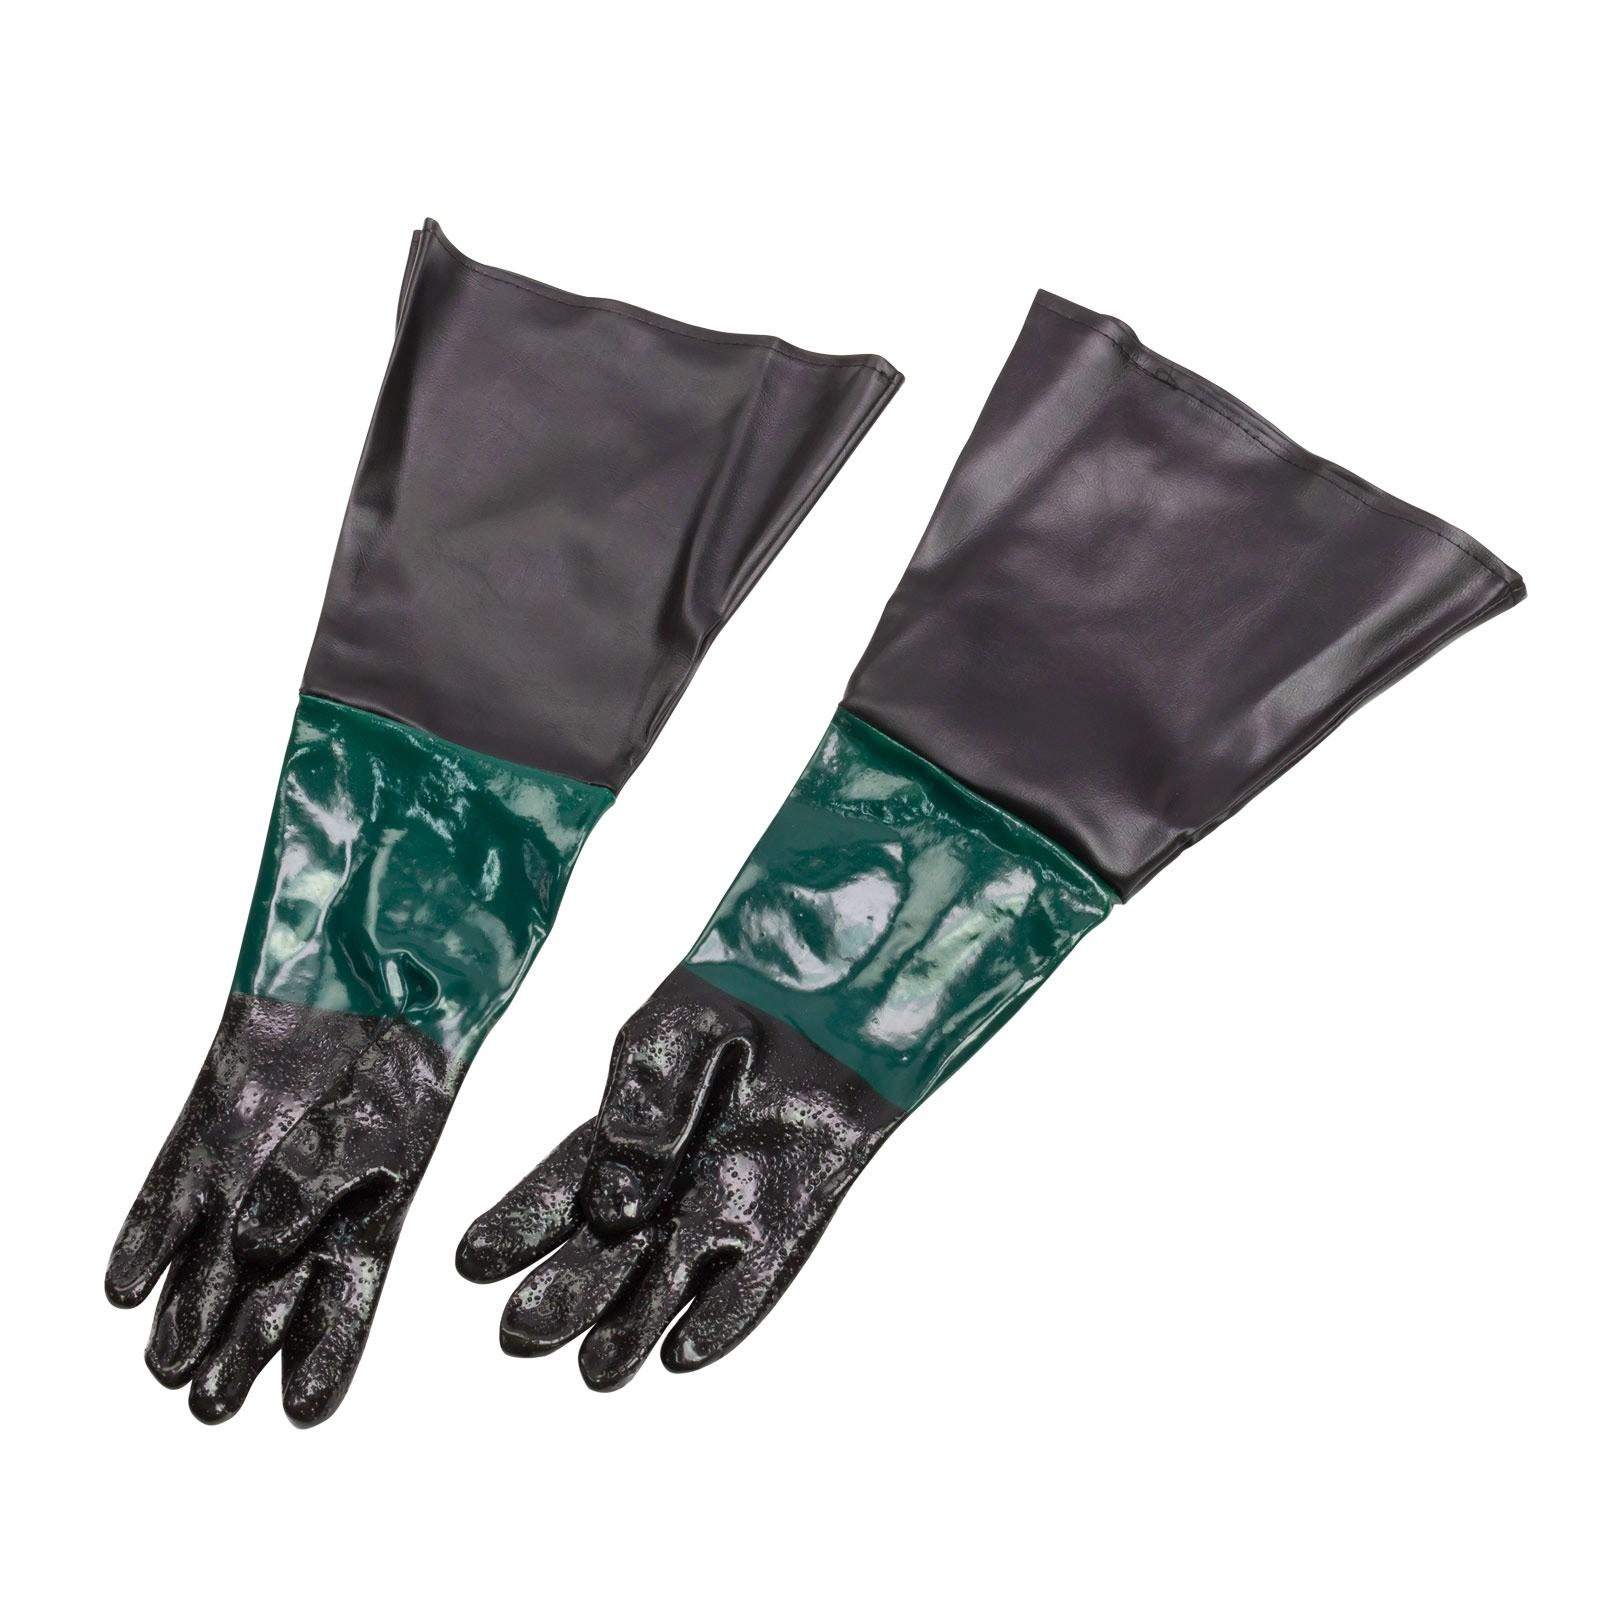 Dema Sandstrahl Handschuhe Paar Gummihandschuhe Sandstrahlkabine ZA24656